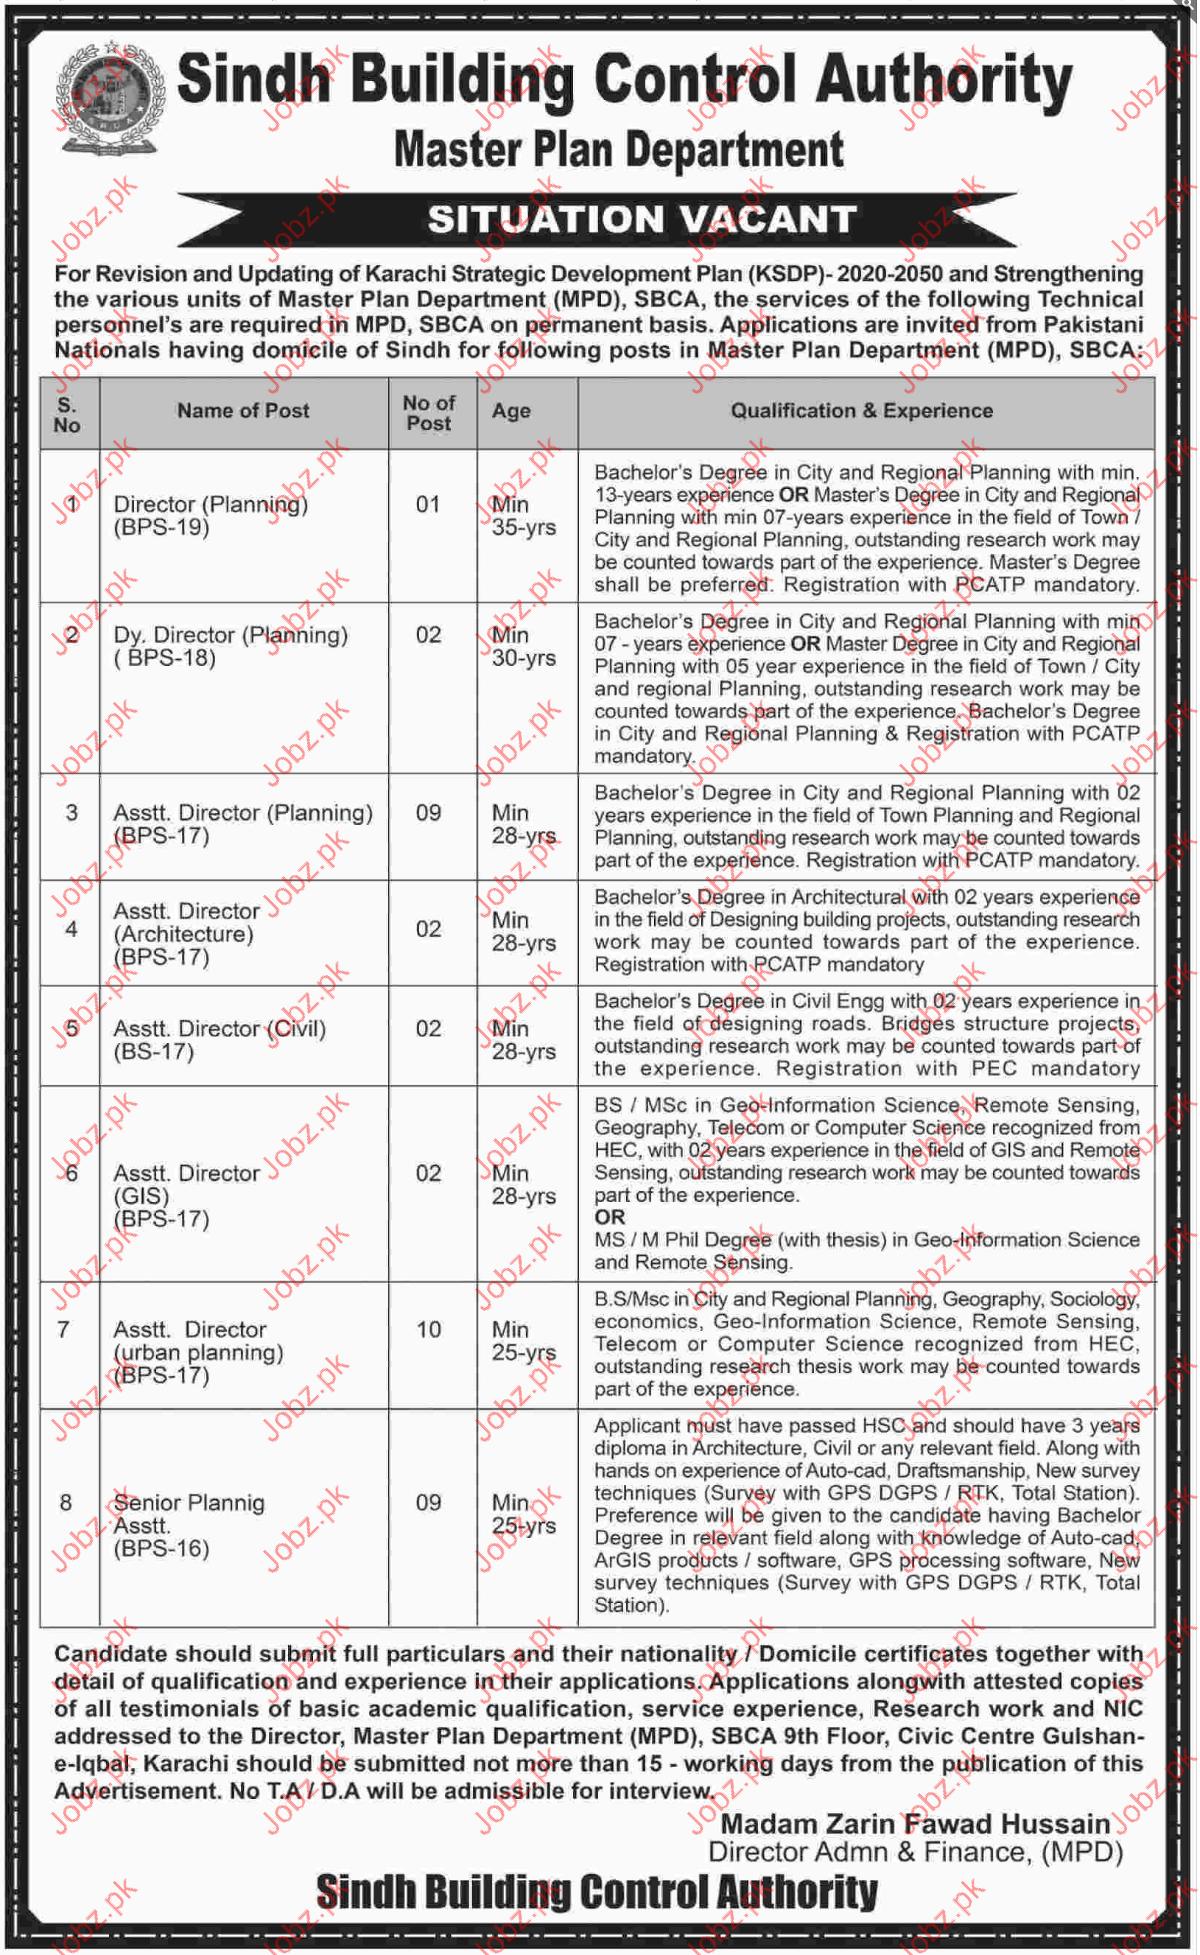 sindh building control authority sbca jobs 2019 job